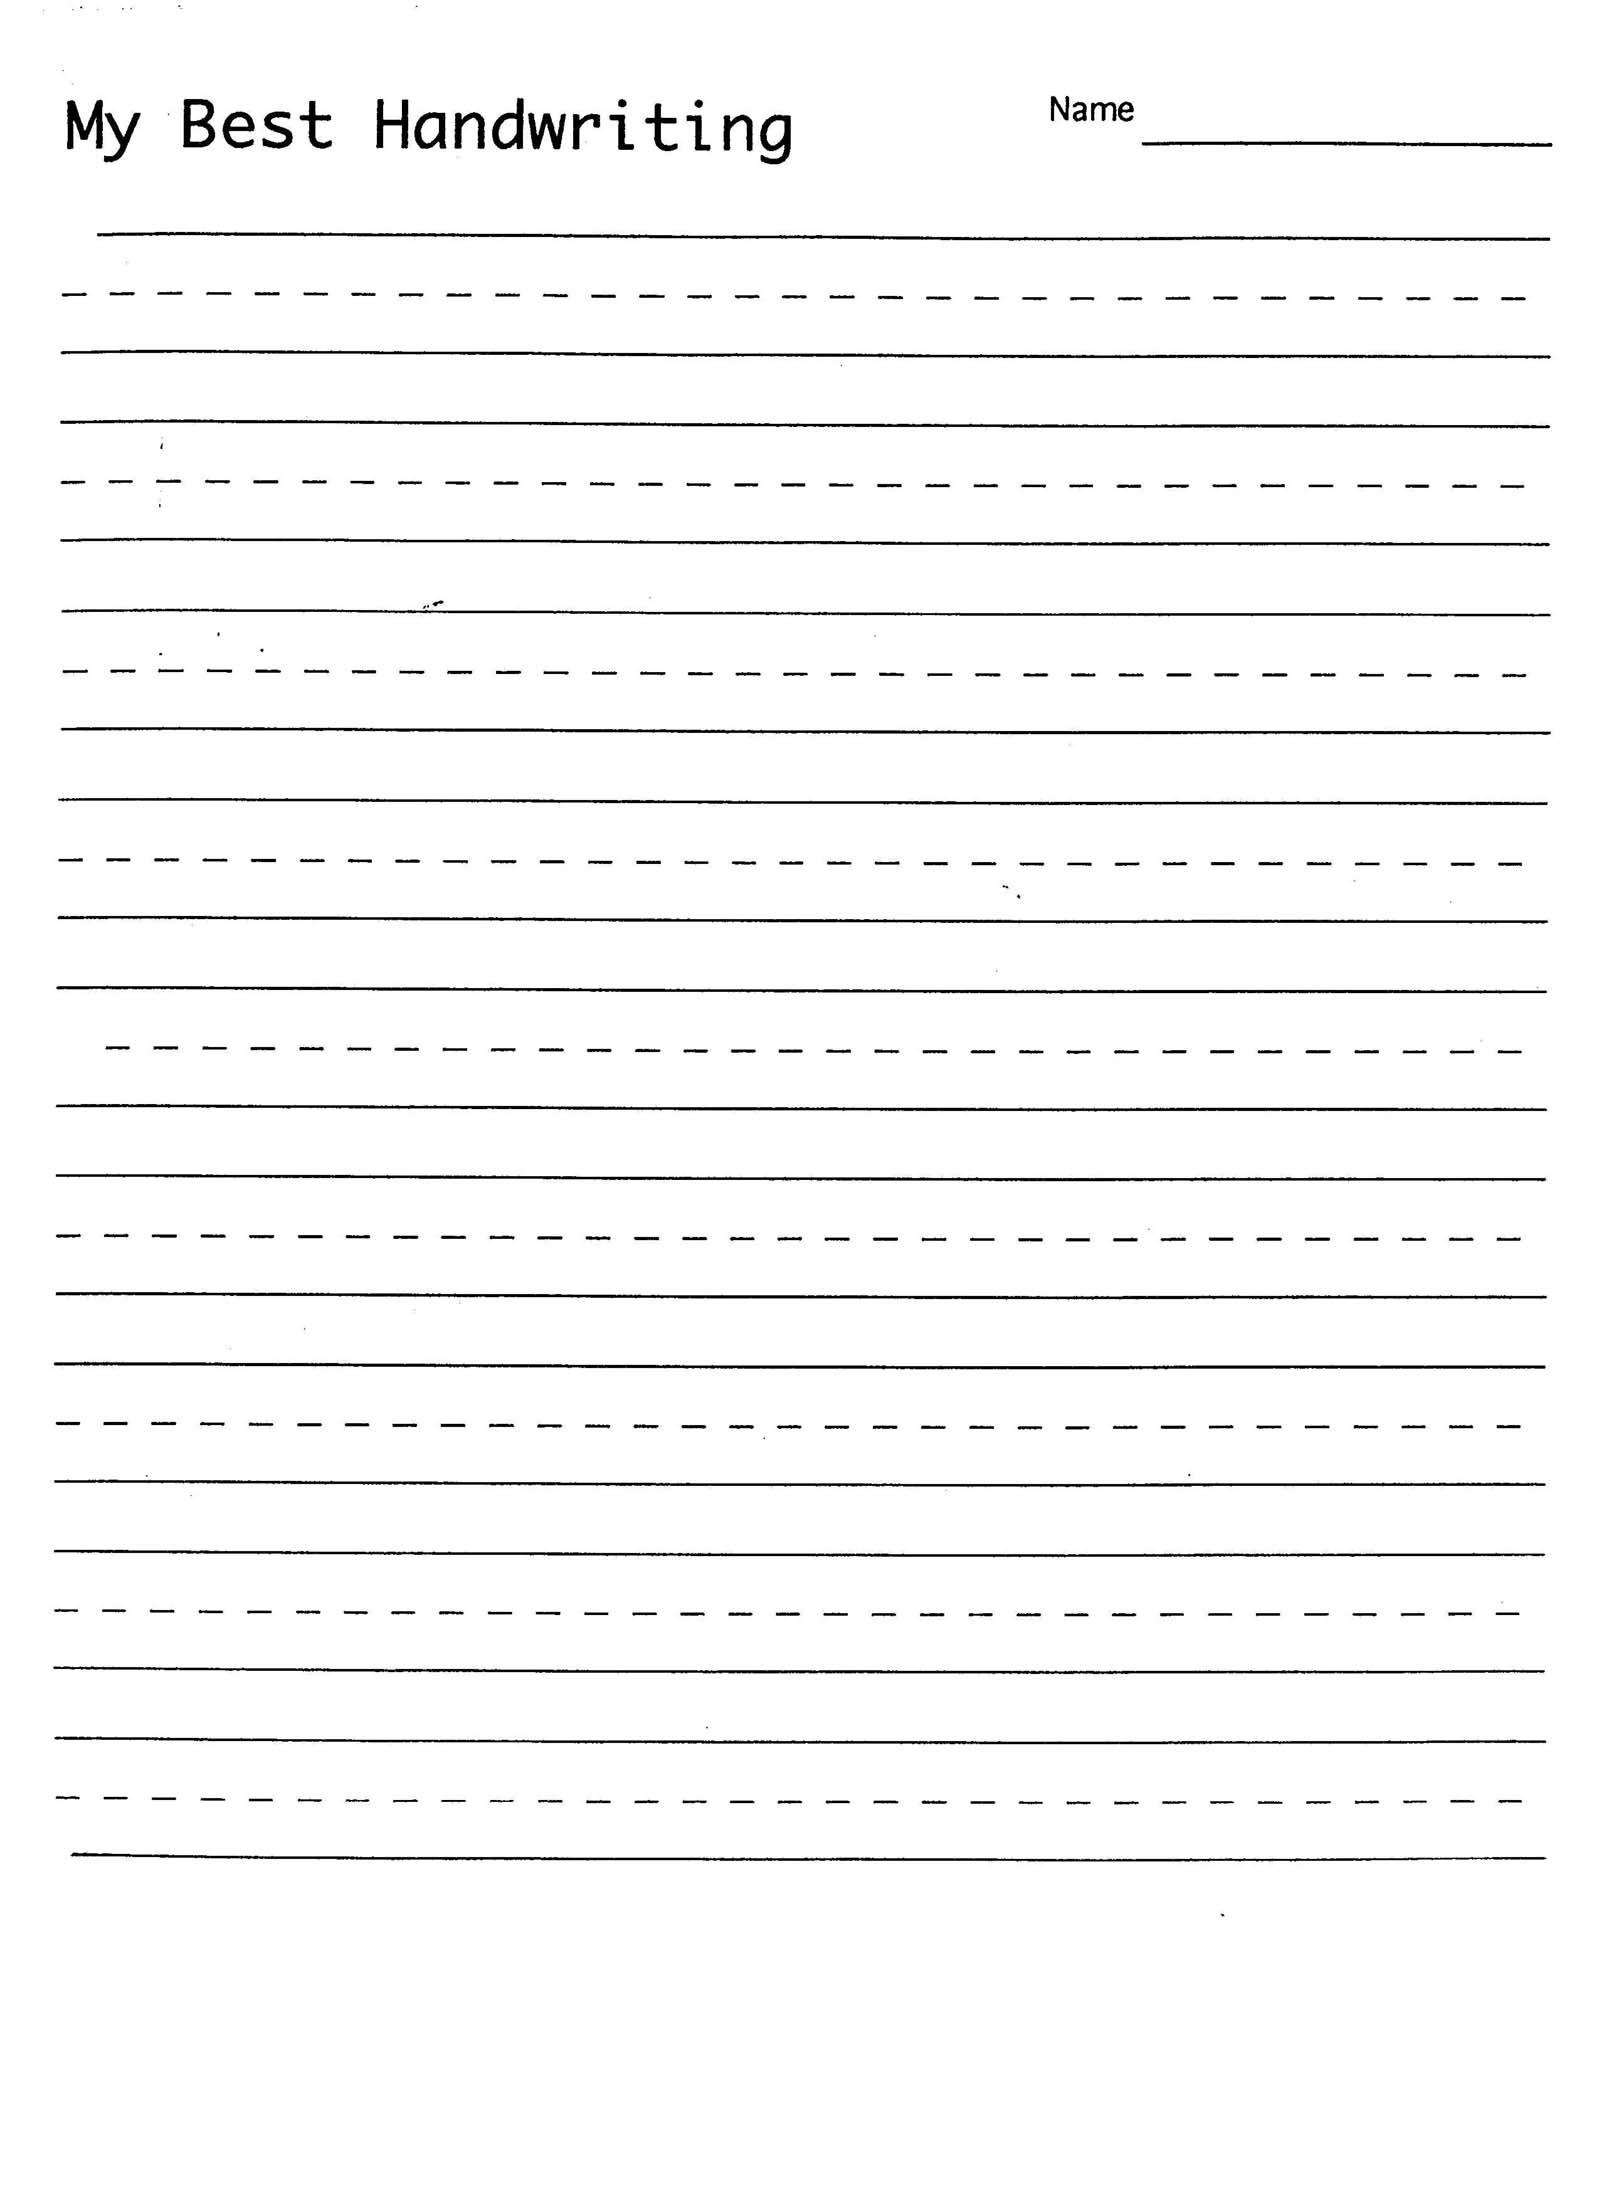 handwriting sheets printable